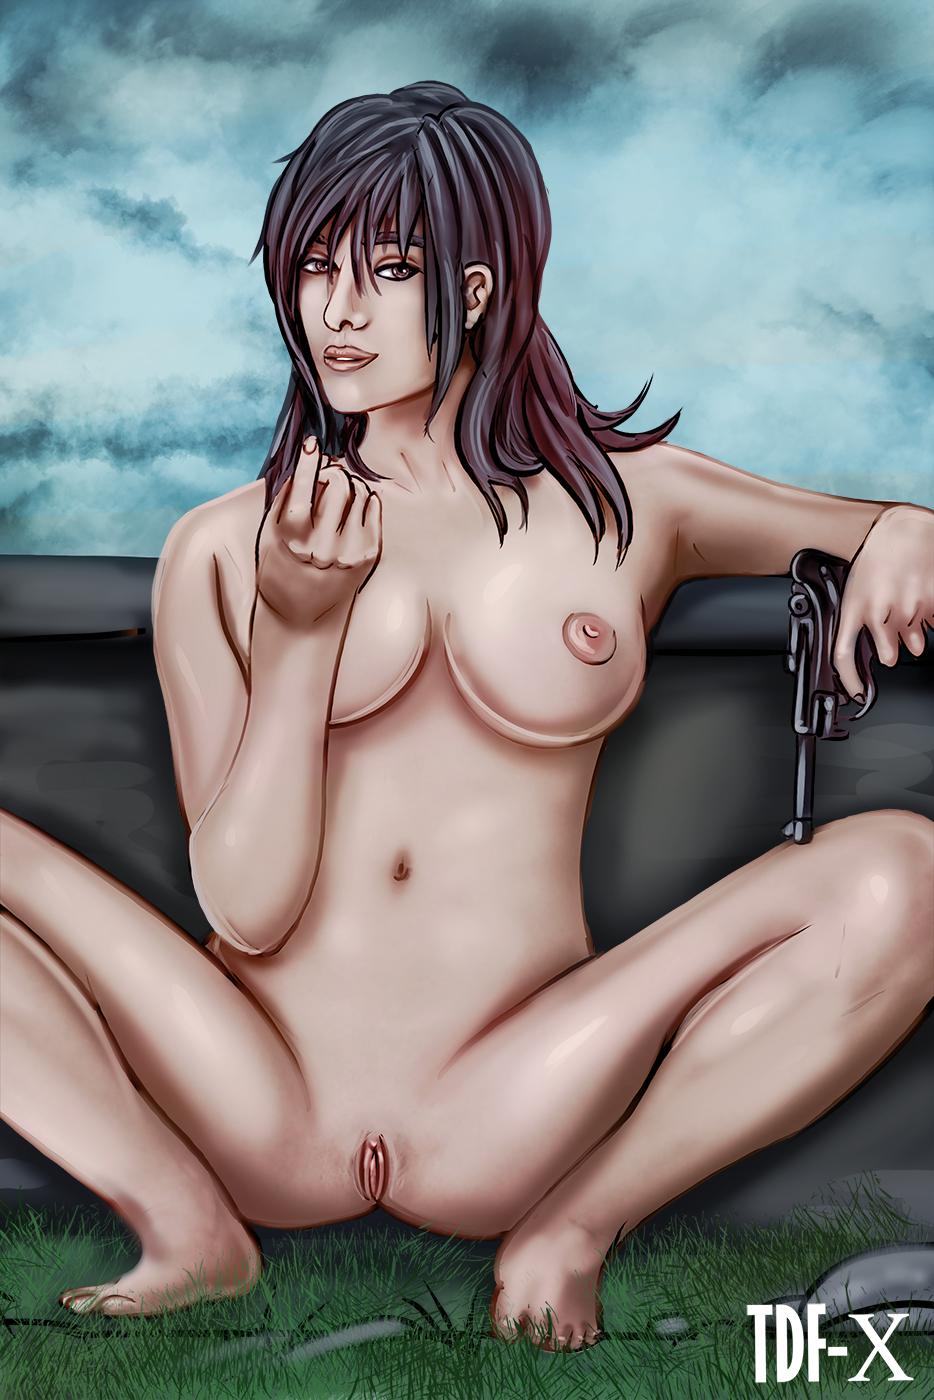 Naruse Ibara